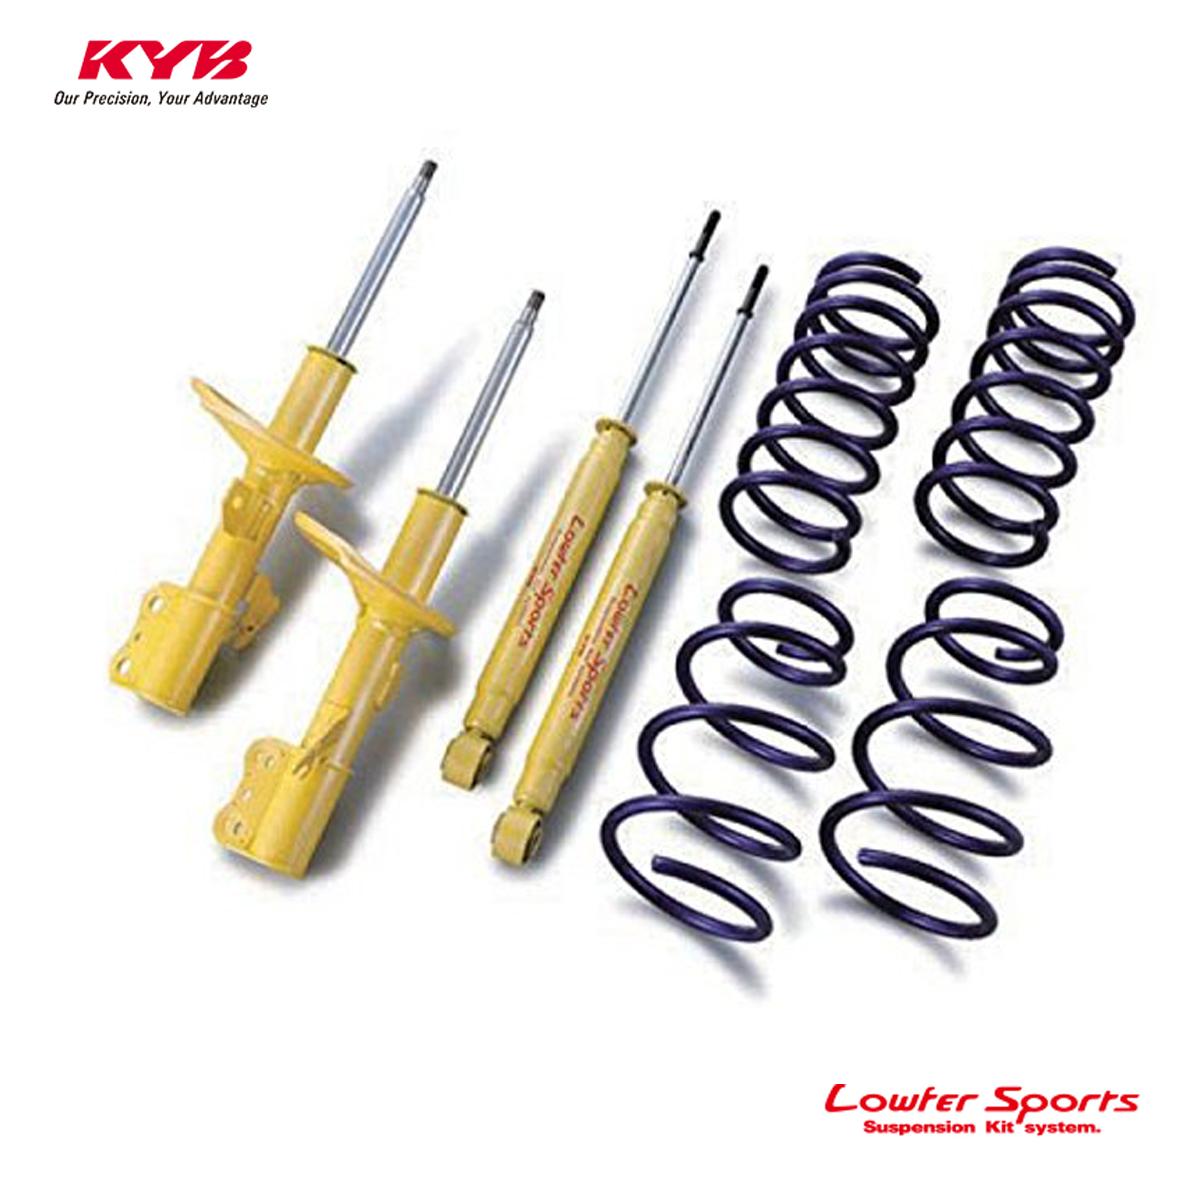 KYB カヤバ ルークス ML21S ショックアブソーバー サスペンションキット 1台分 ローファースポーツ キット Lowfer Sports LKIT-MK21S